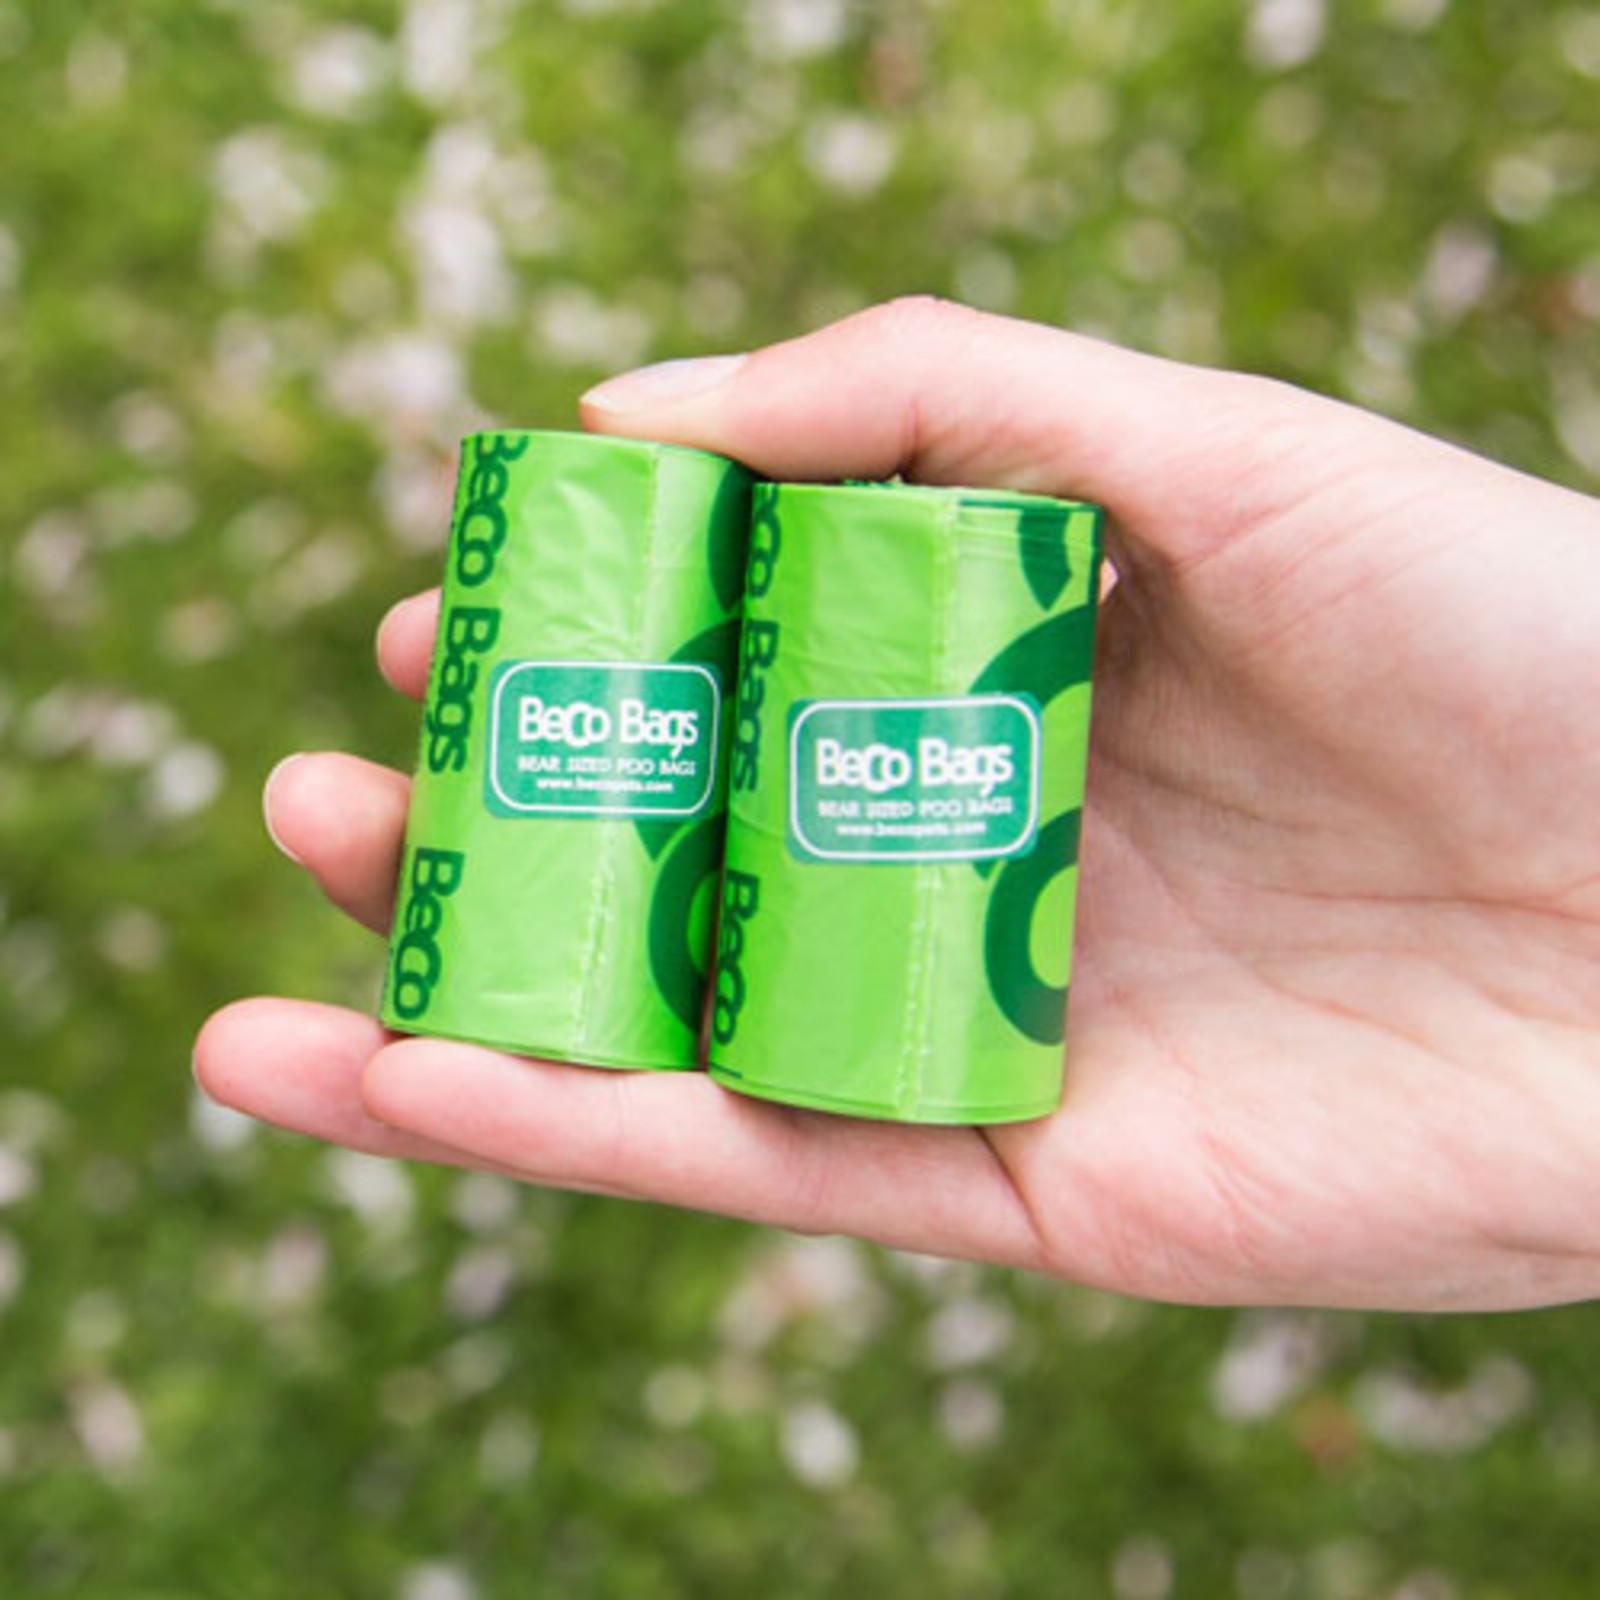 Beco Bags | Eco-Friendly Poop Bags  |  Mega Dispenser